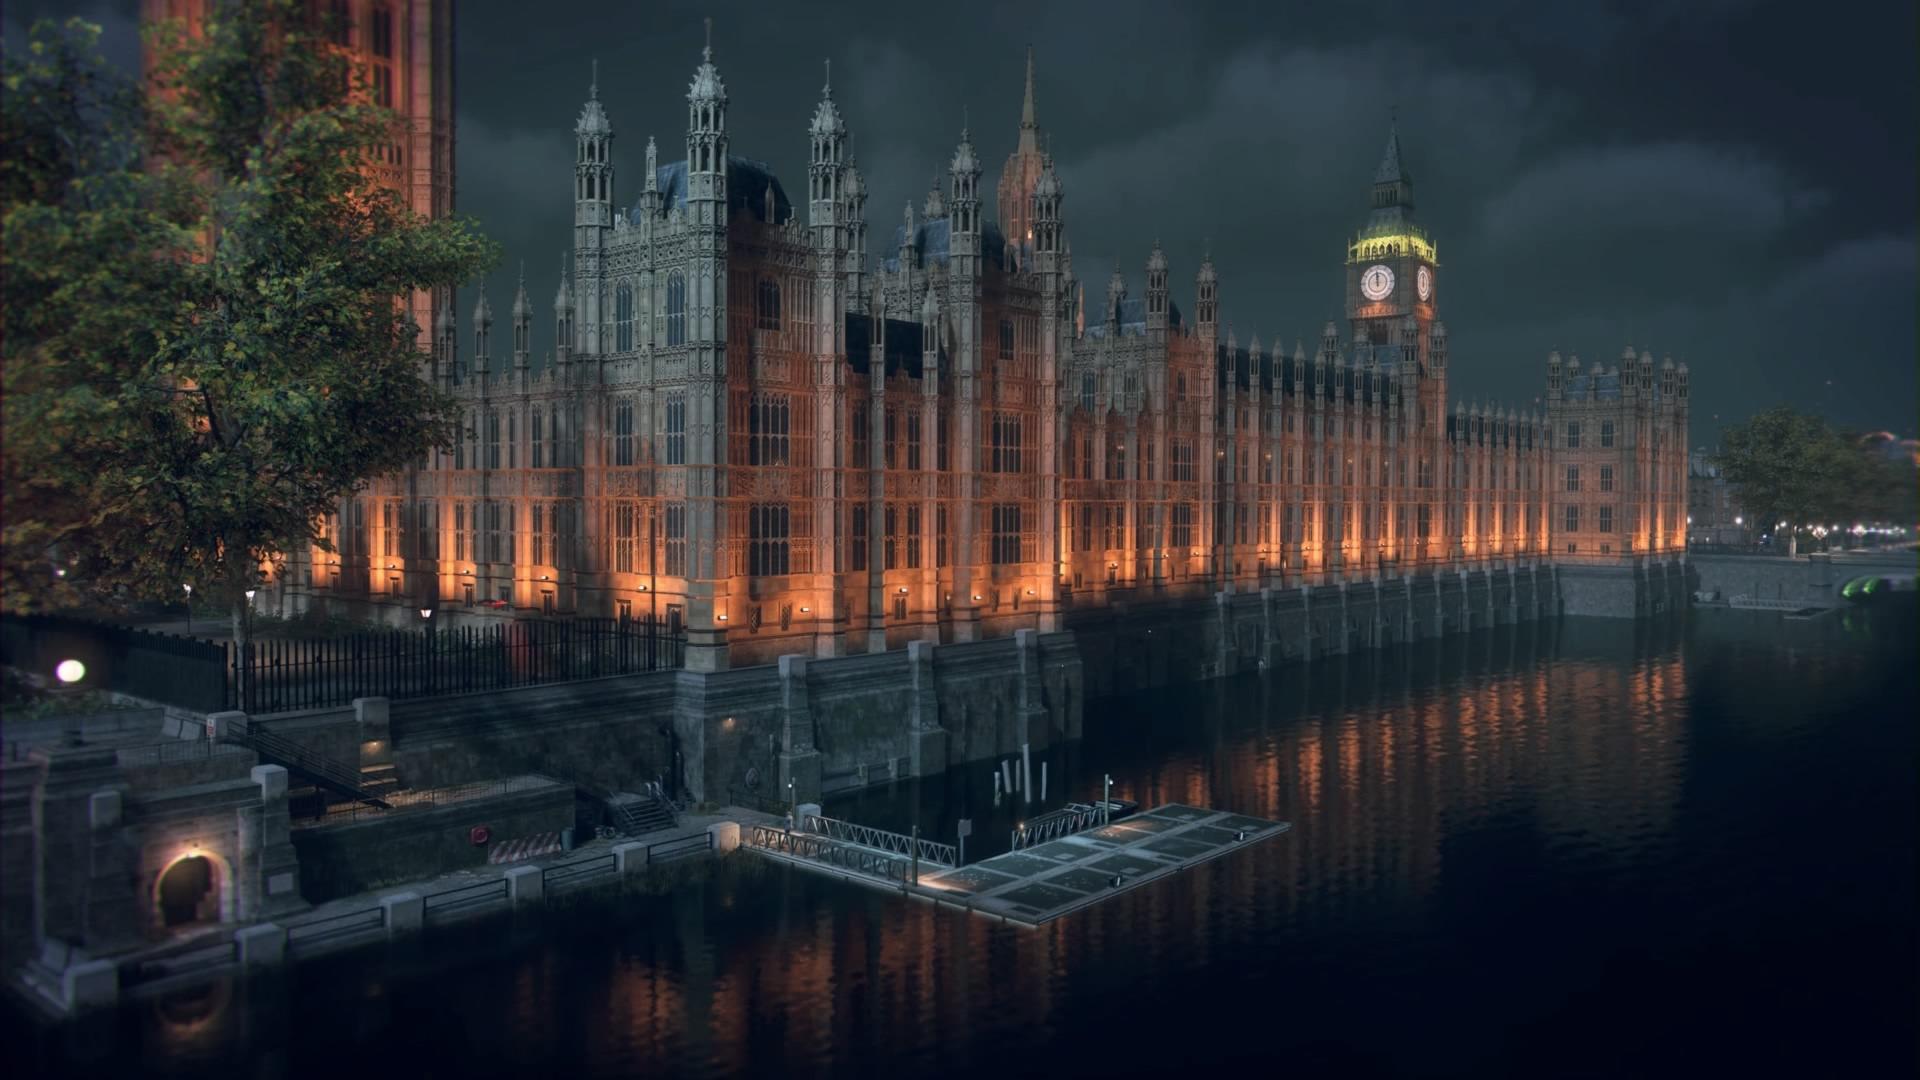 watch dogs London by night